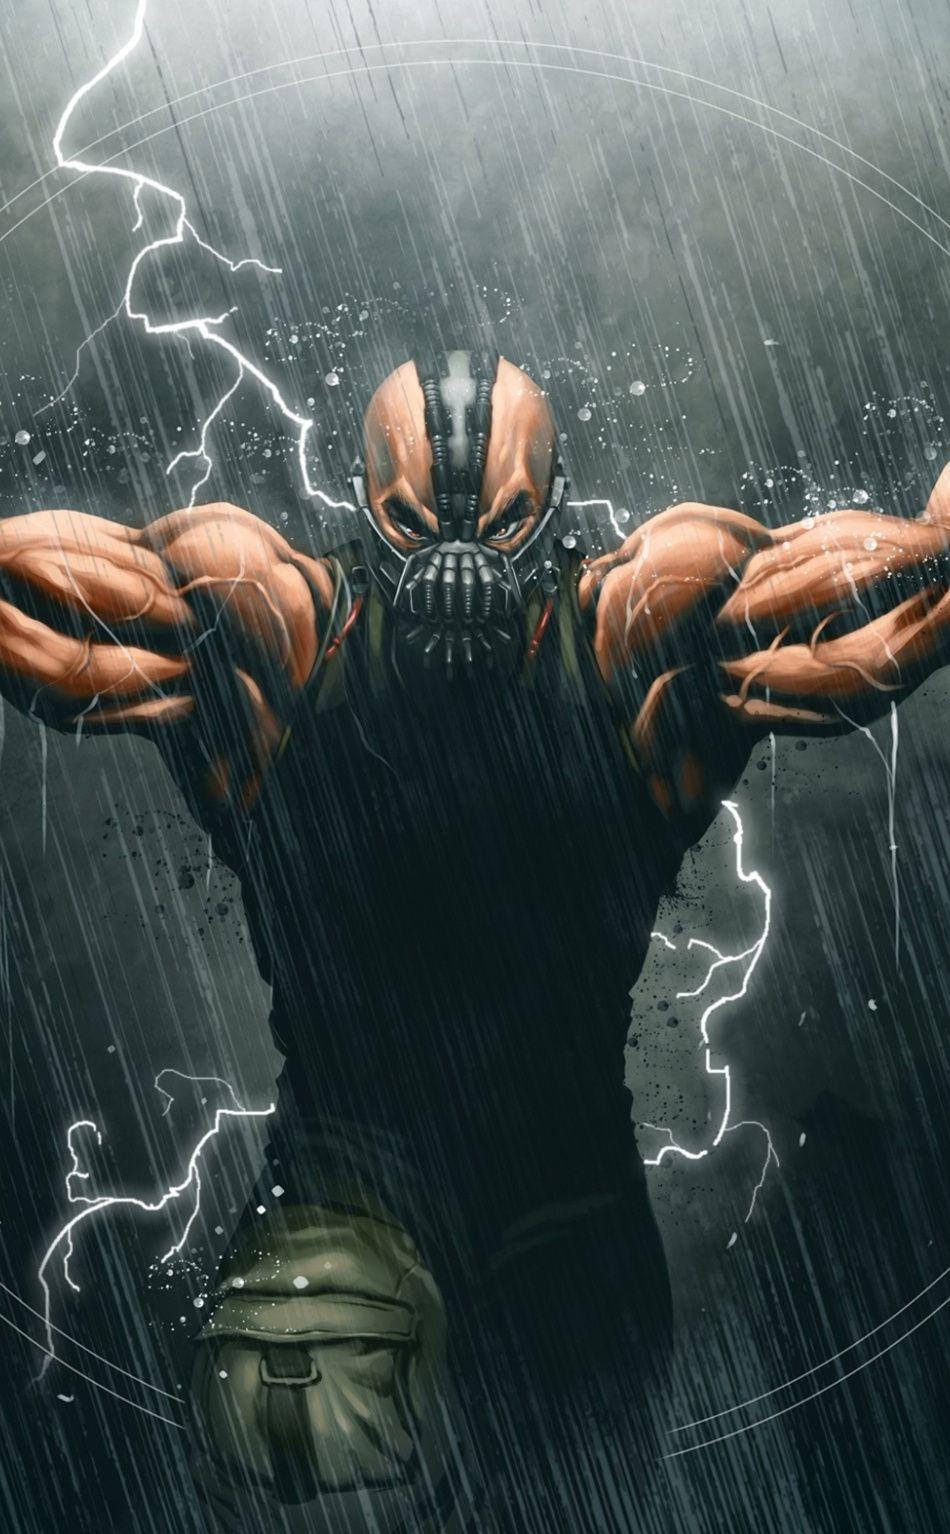 Bane Movie Villain Marvel Comics Art 950x1534 Wallpaper Bane Batman Marvel Comics Art Comic Villains